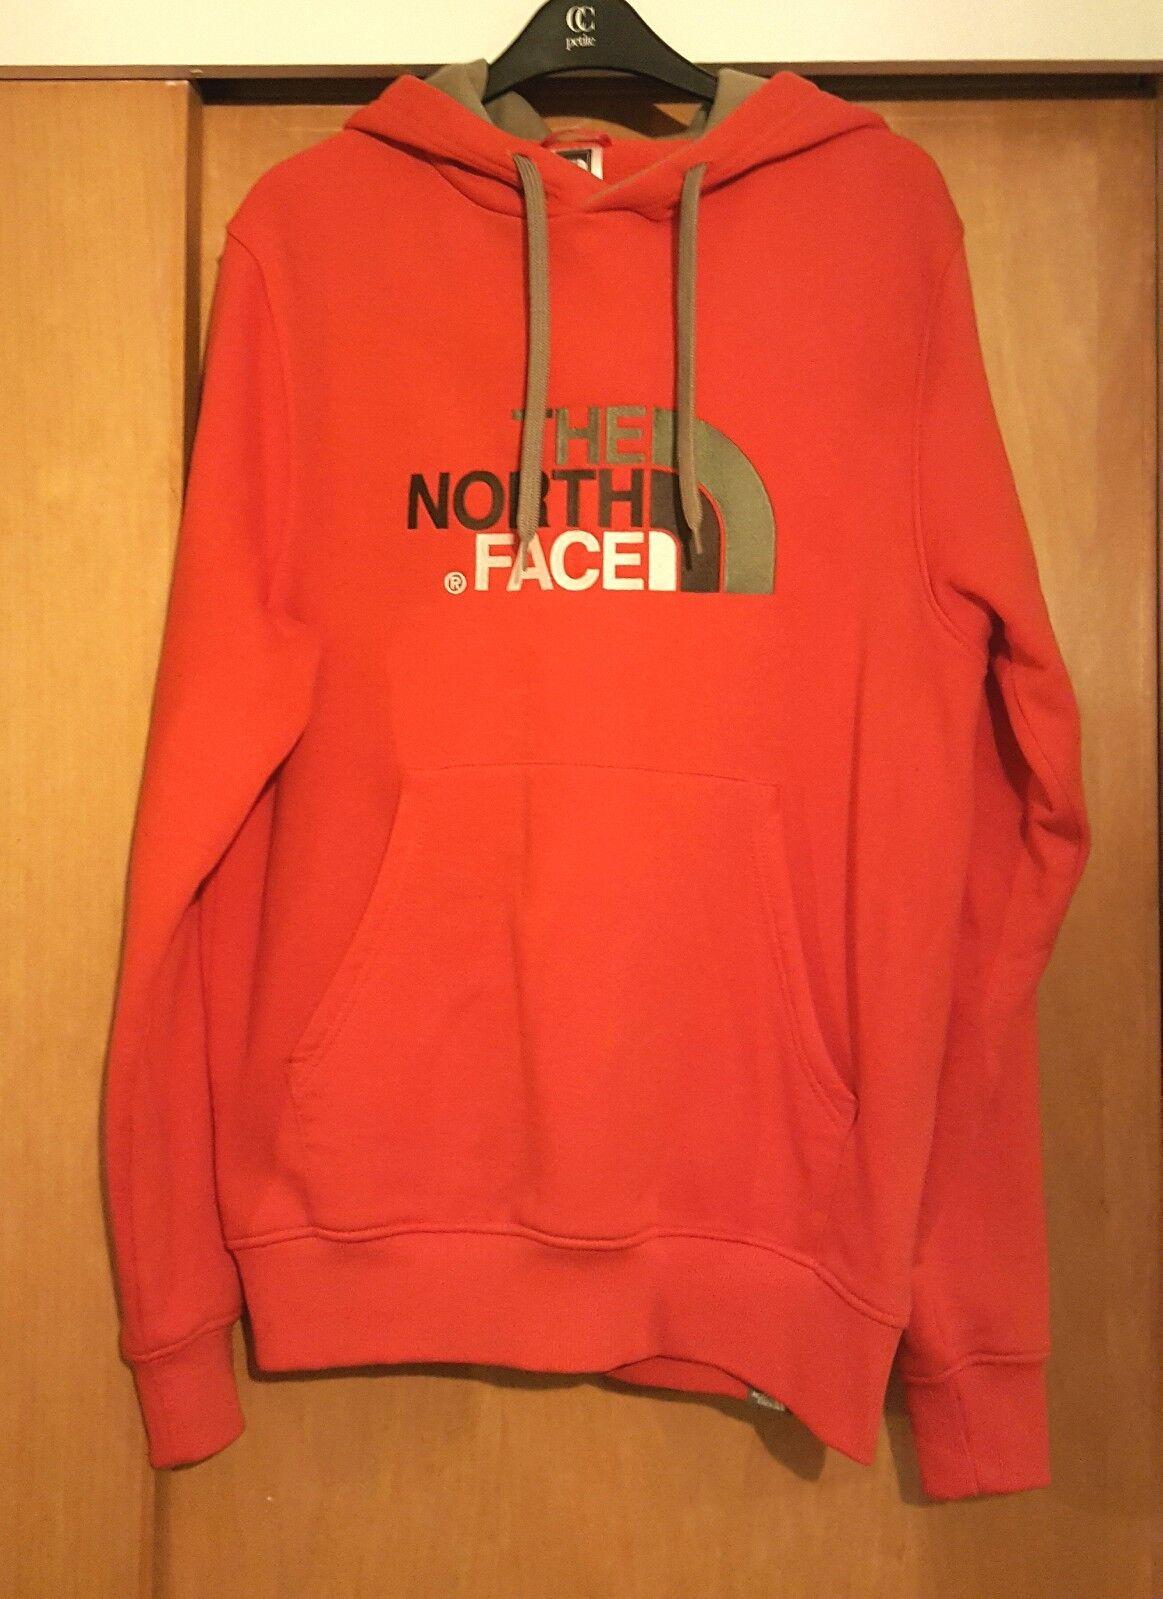 The North Face Hoodie / Sweatshirt - ROT/Khaki -  Herren - Größe Small - NEW